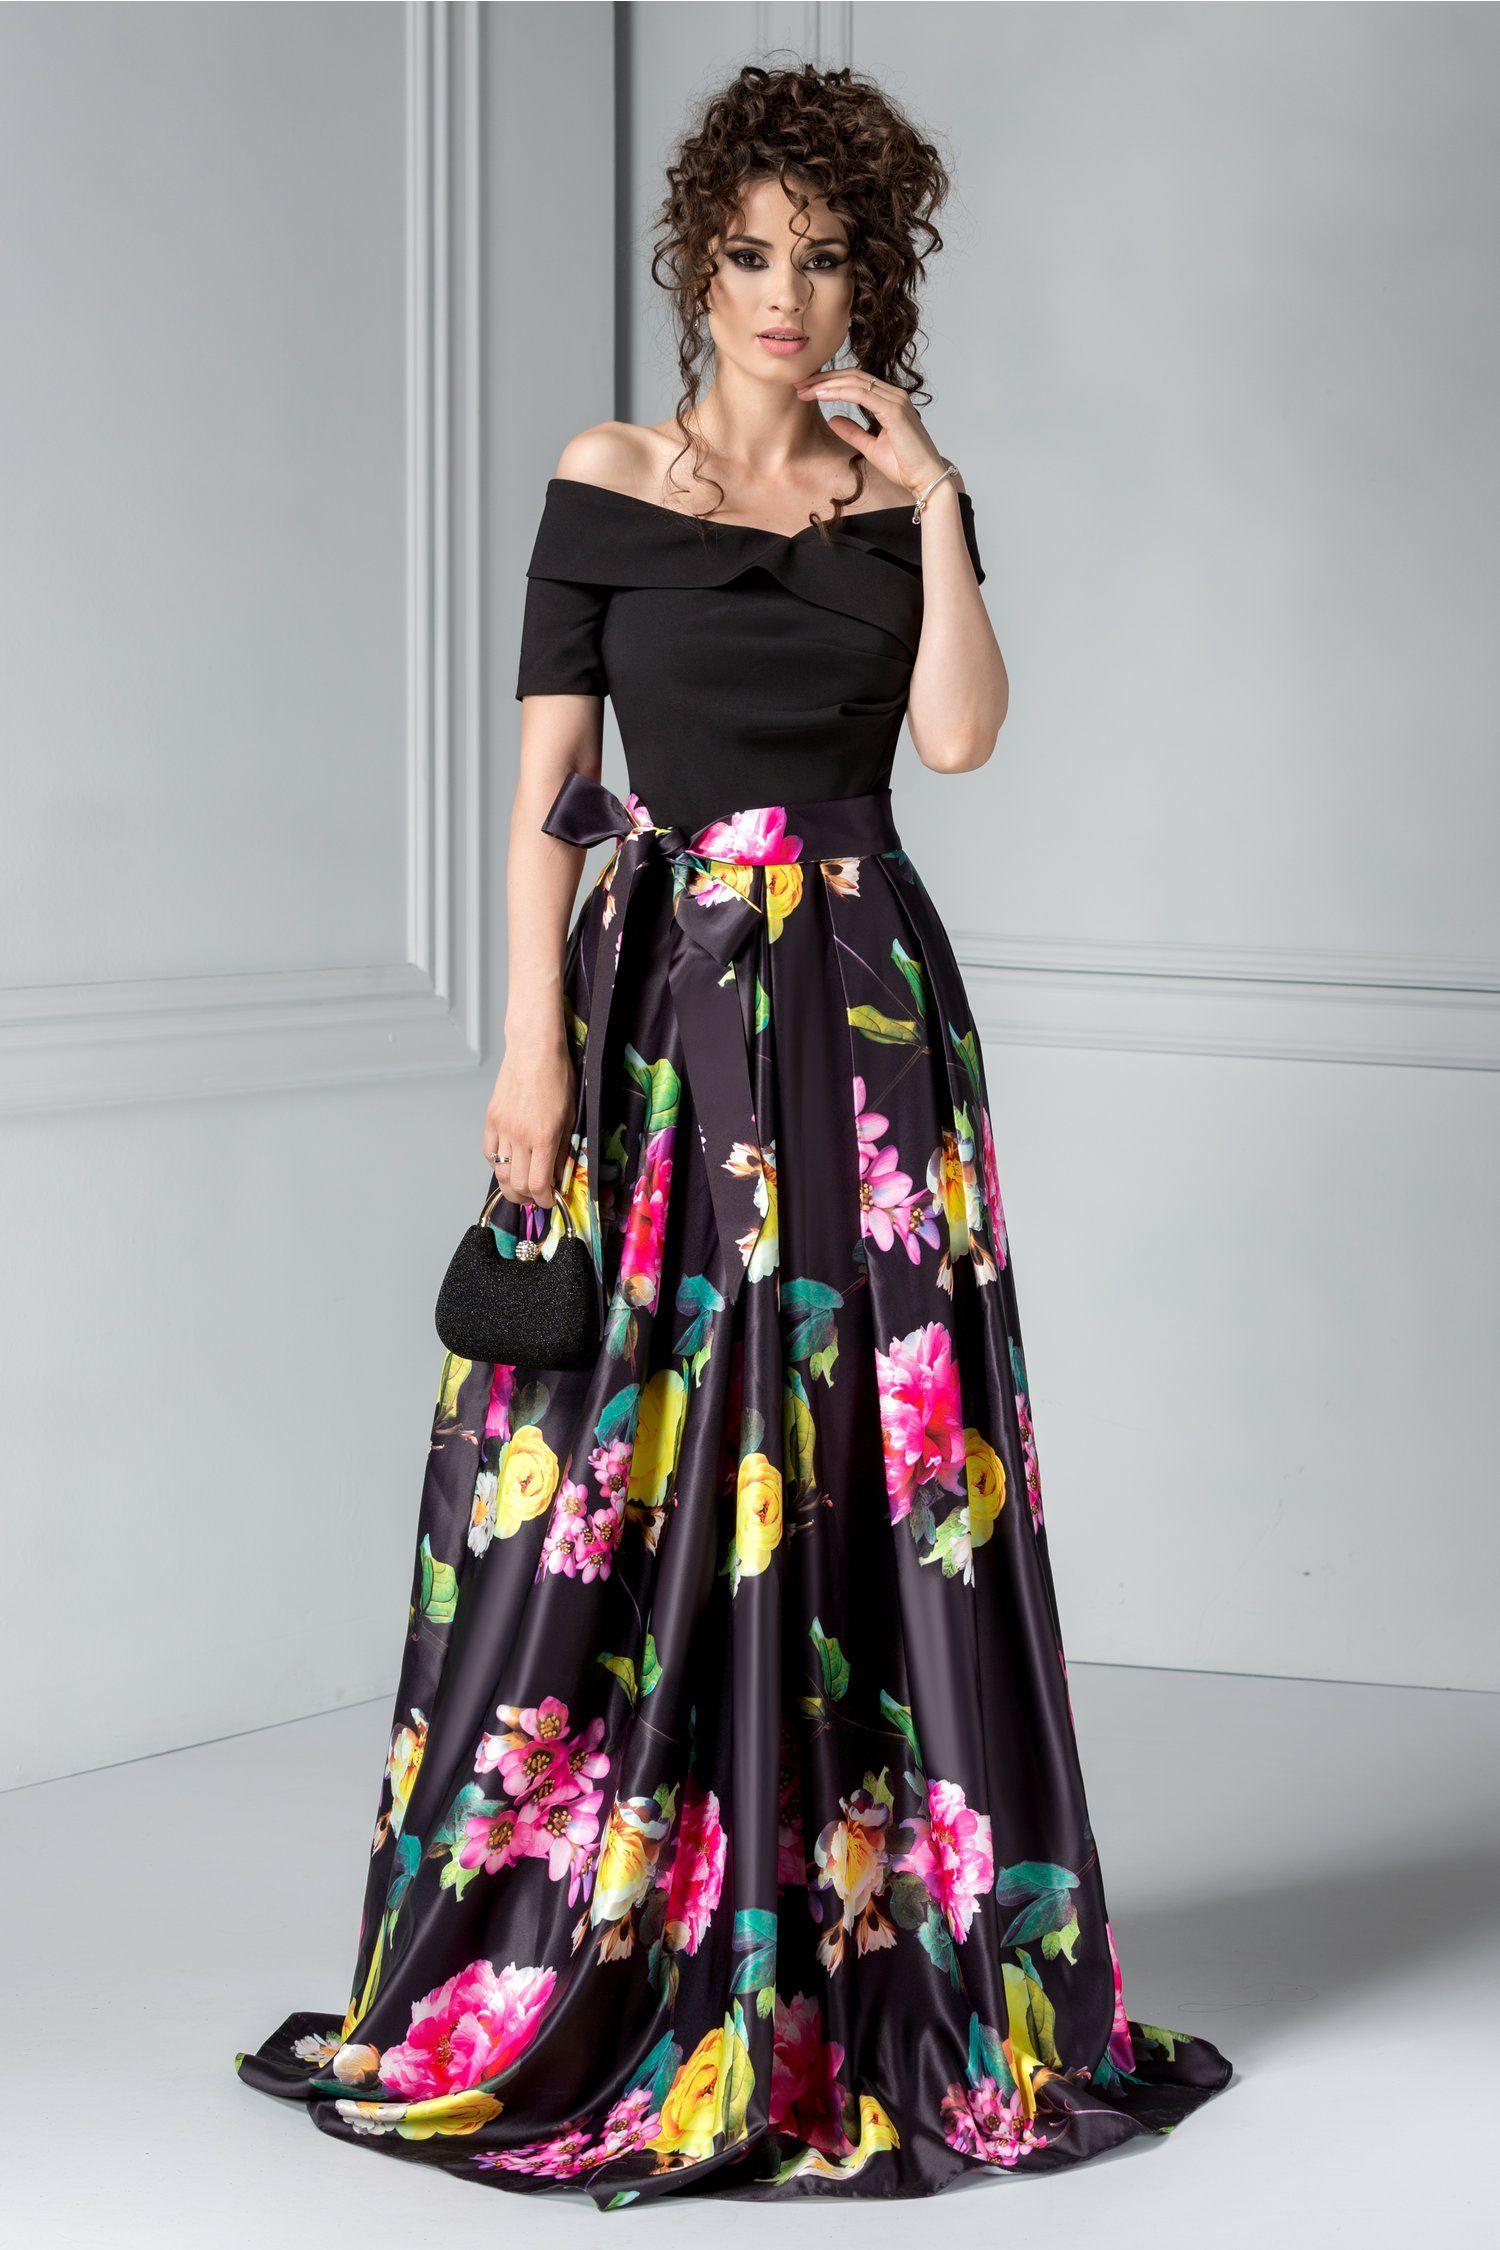 Rochii De Seara Lungi Ieftine în 2019 Moda Dresses Fashion și